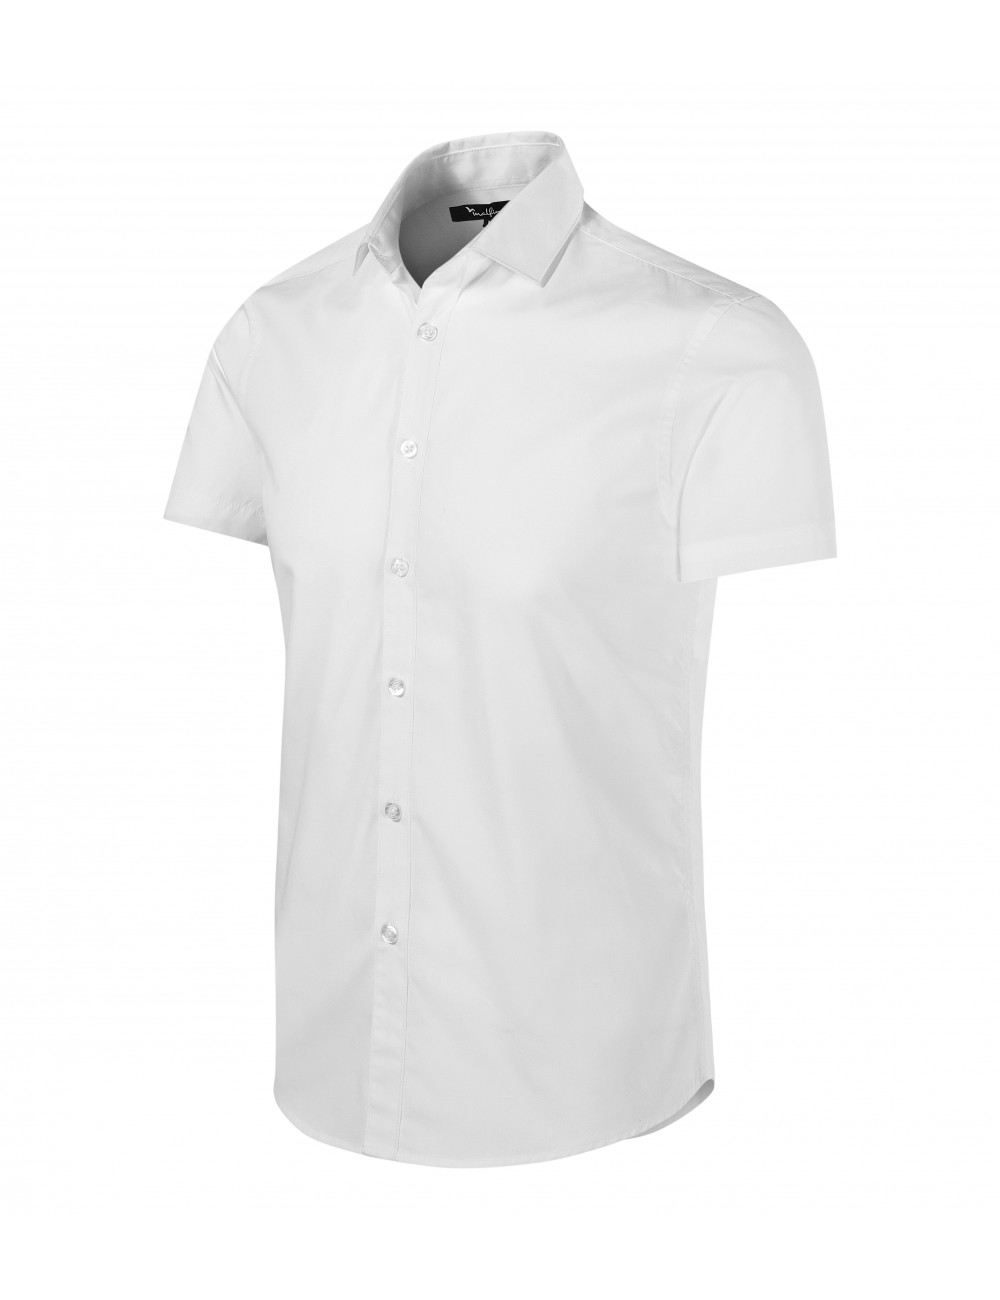 Adler MALFINIPREMIUM Koszula męska Flash 260 biały